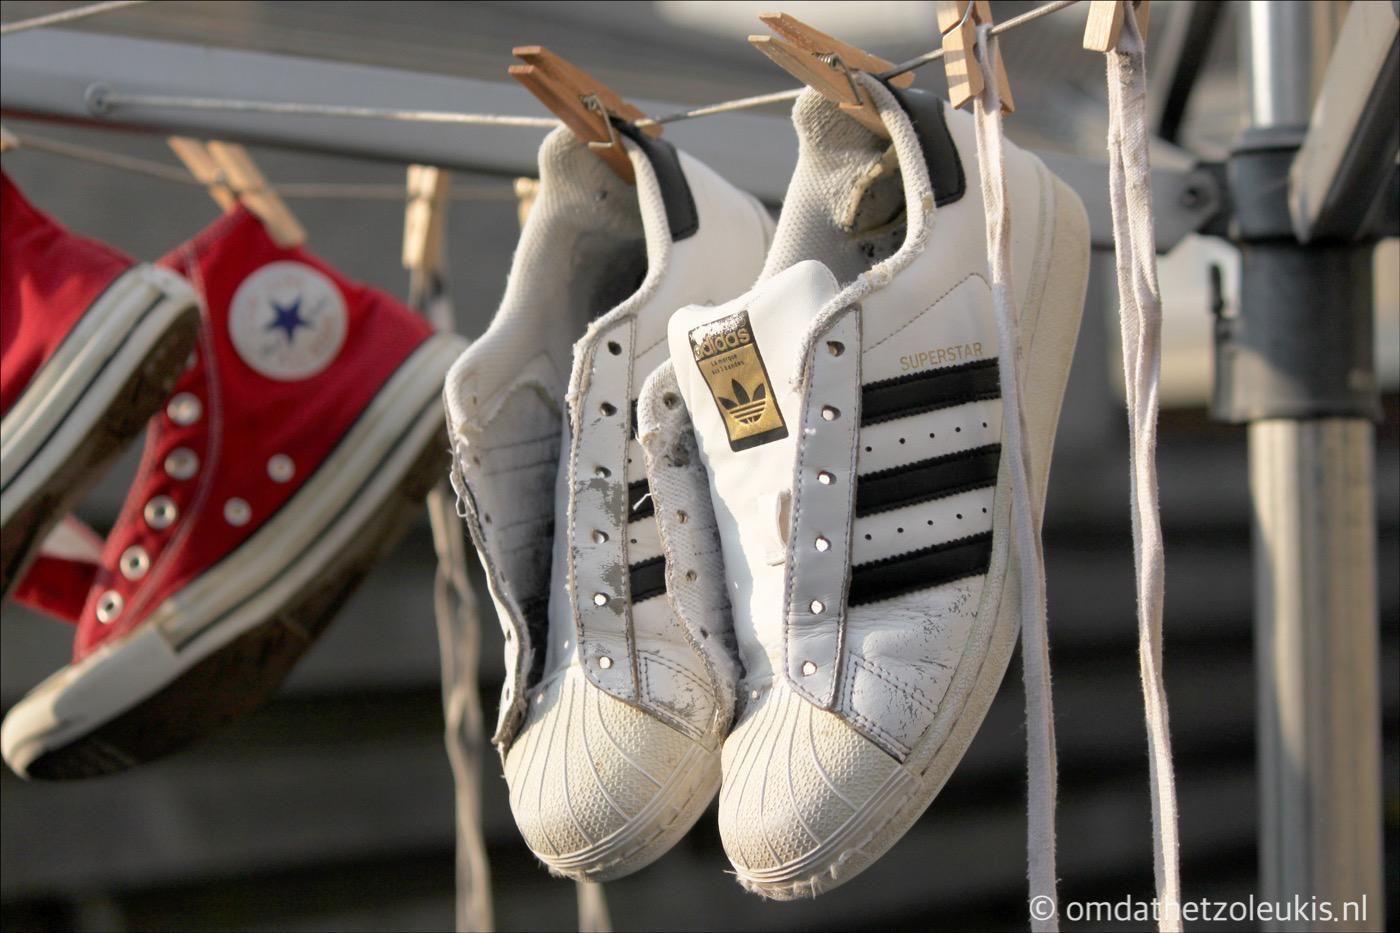 adidas schoenen in de wasmachine